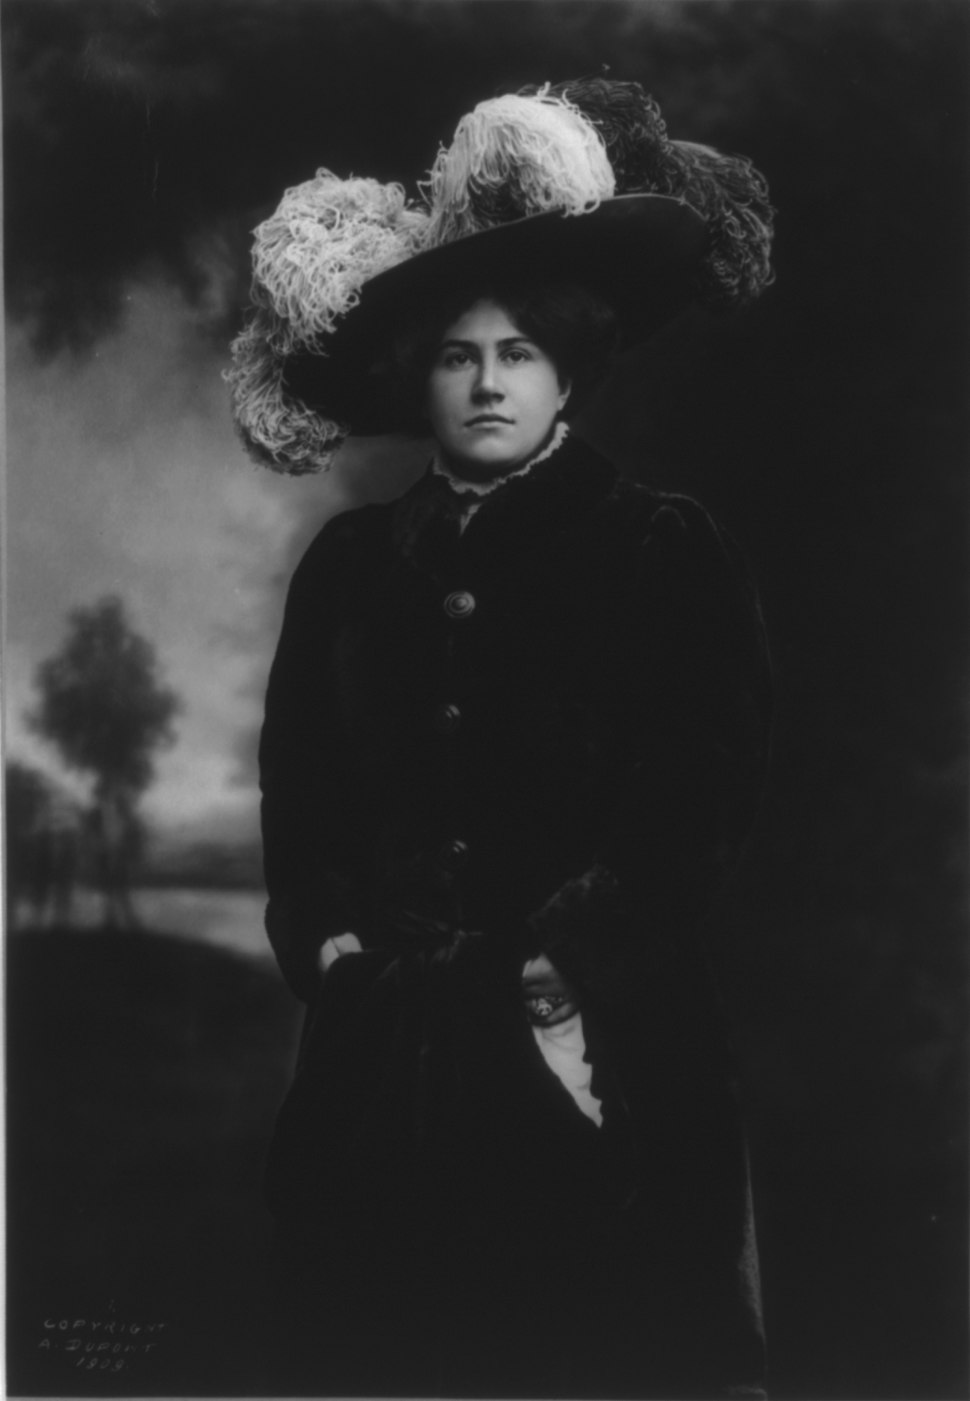 Emmy Destinn, 1878-1930, three-quarters length portrait, standing, facing left, wearing fur hat